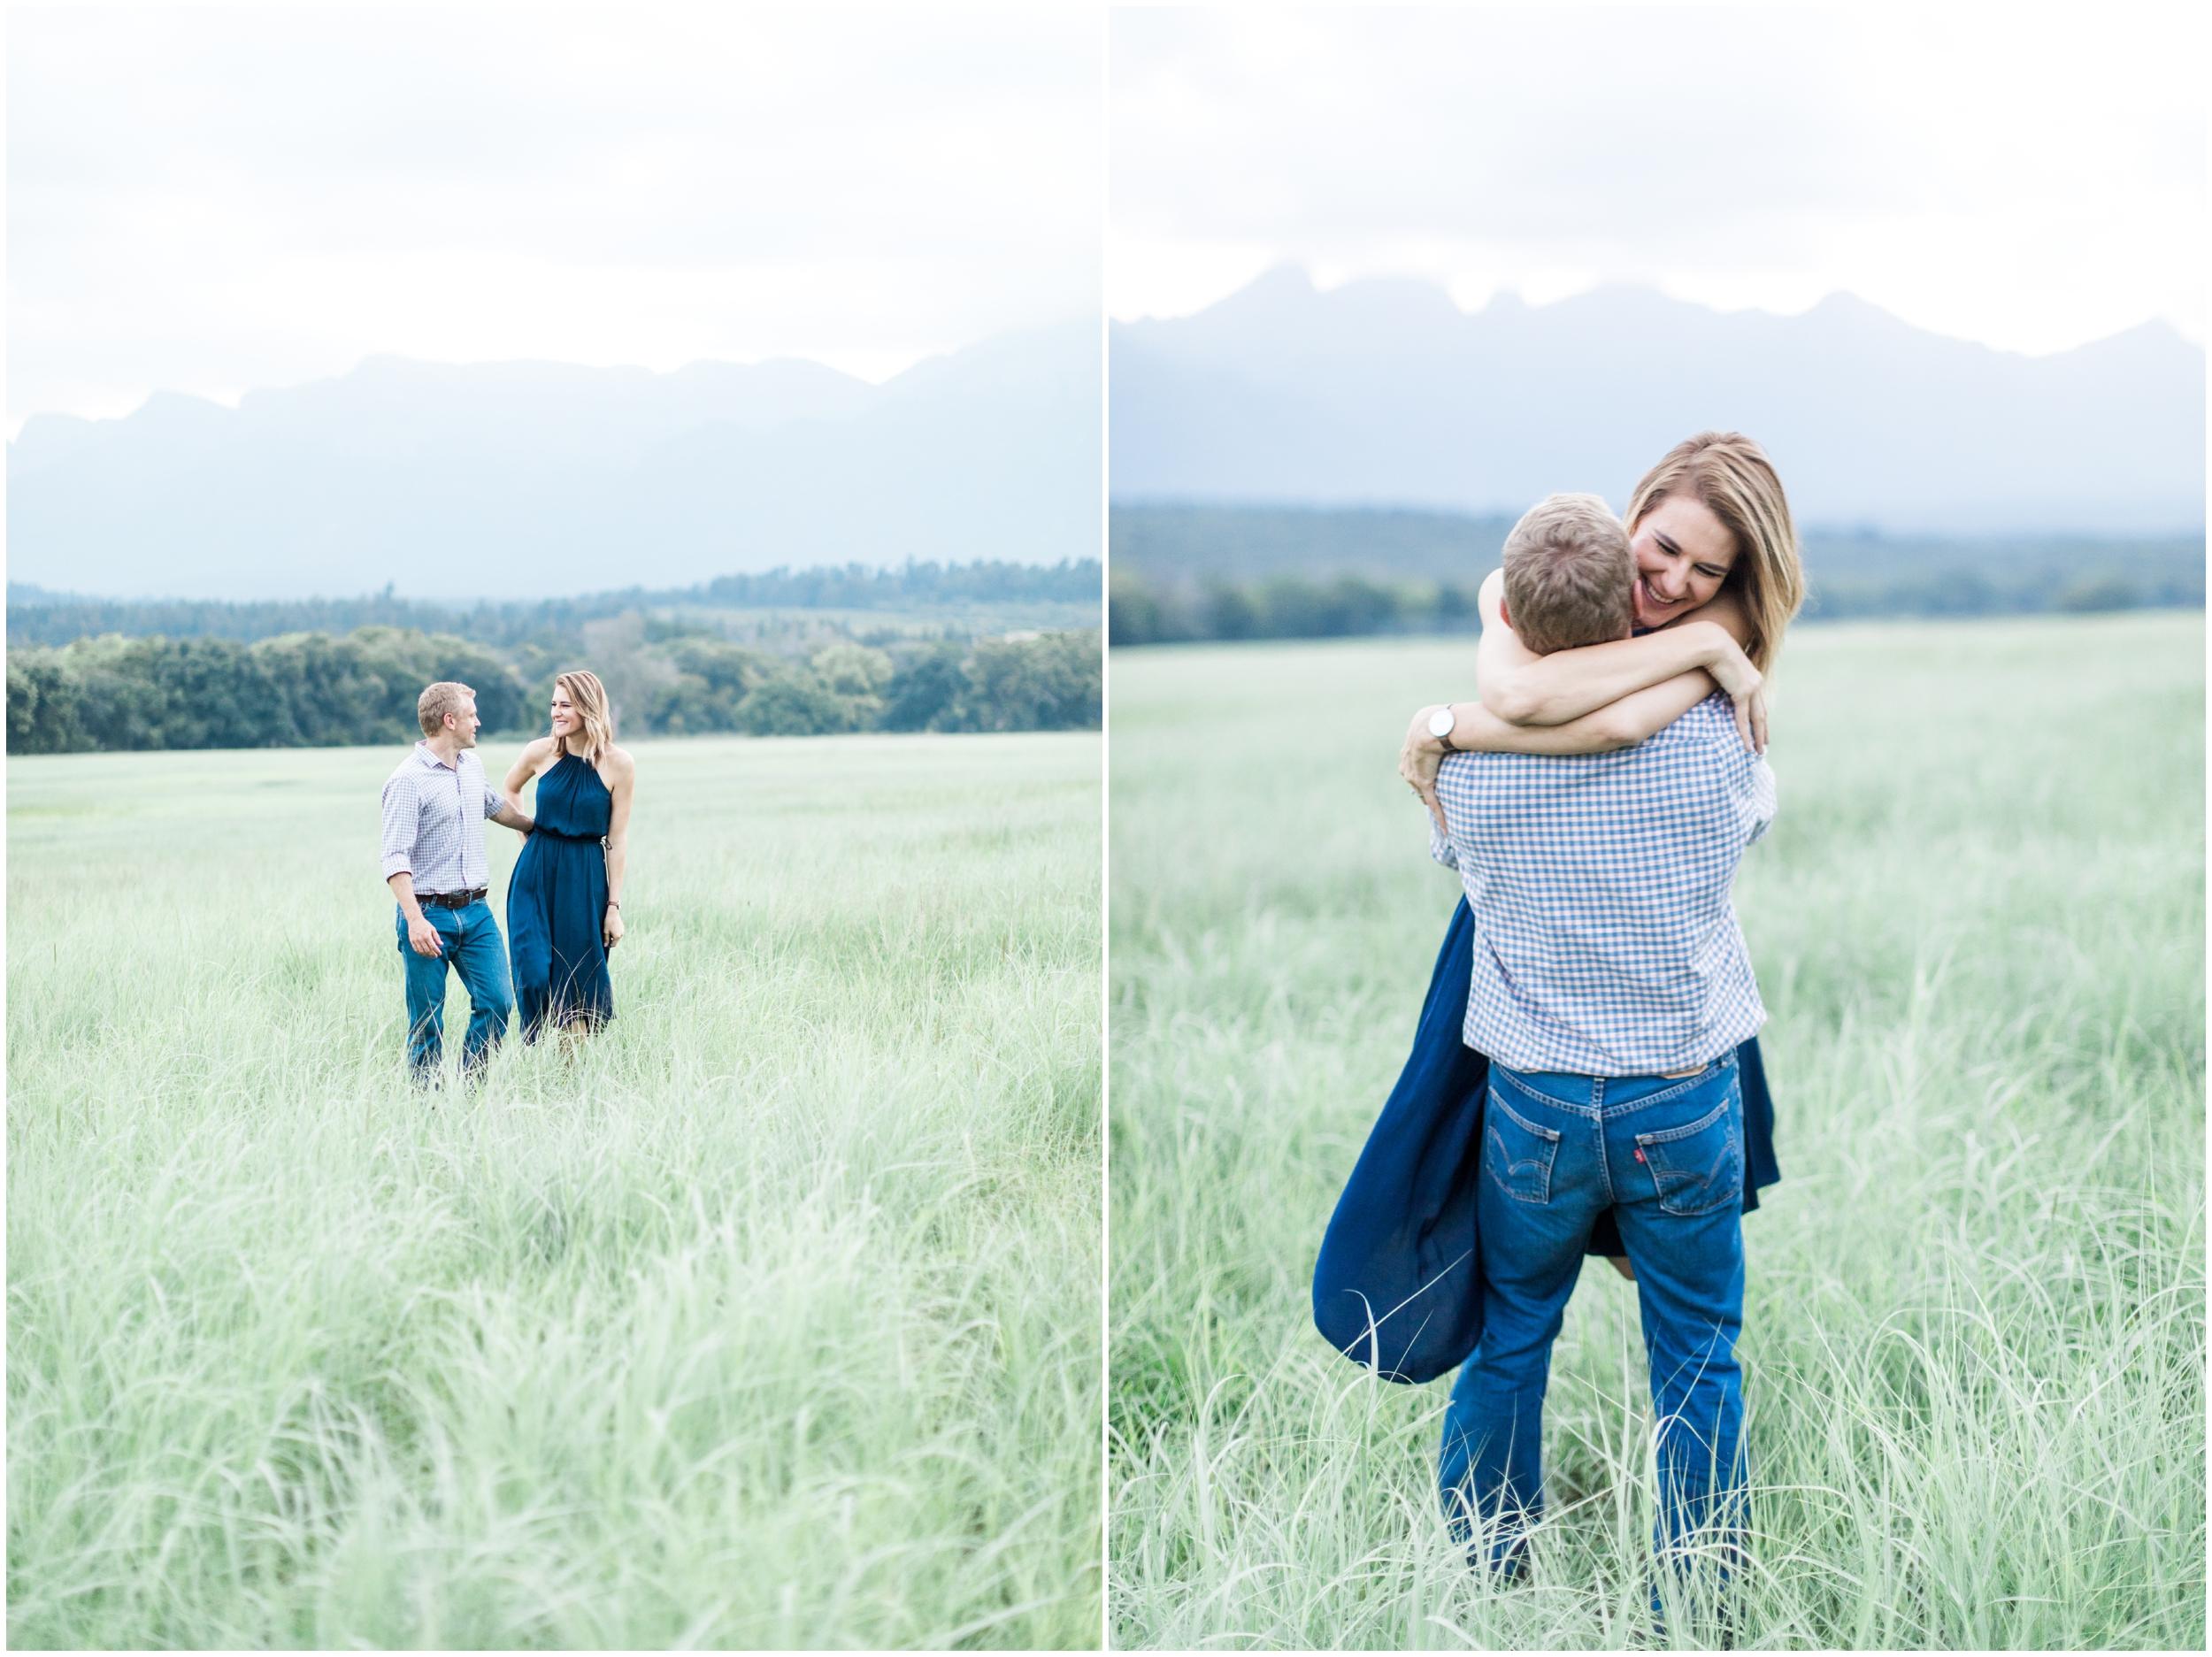 Yvette&Stefan00147.jpg